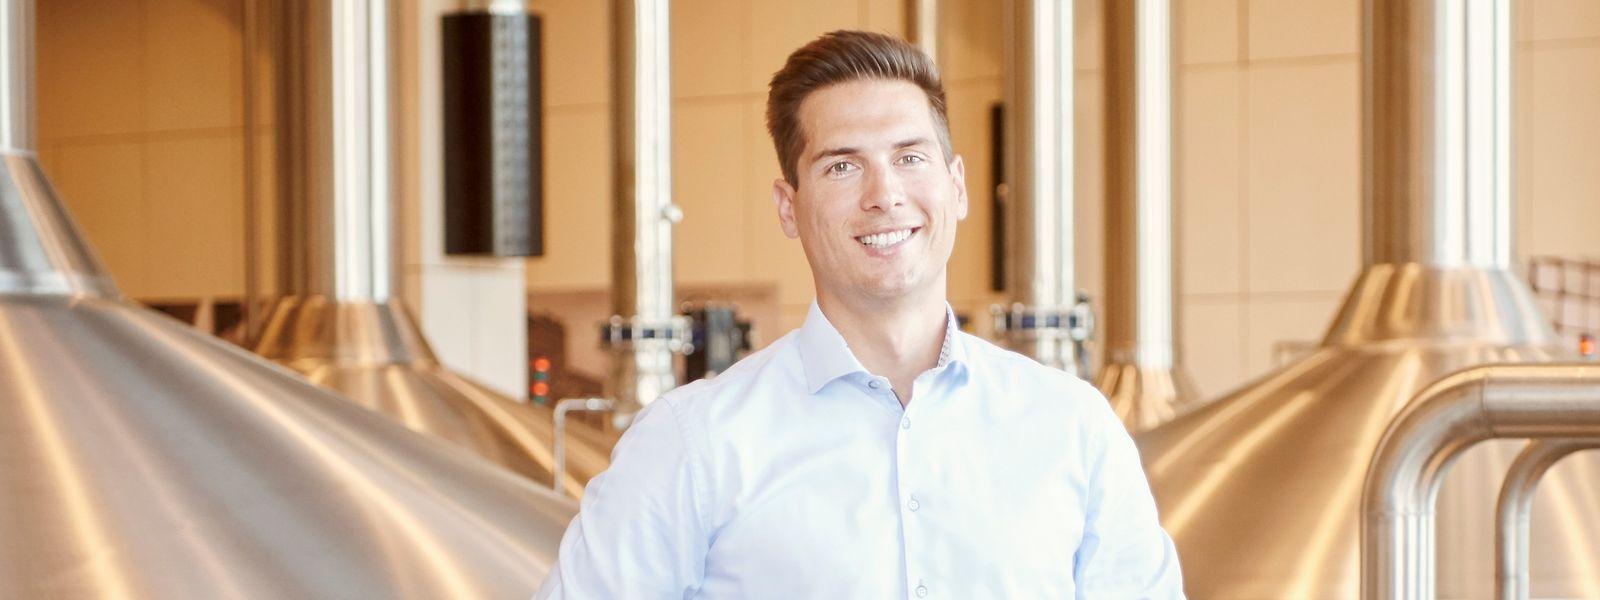 Wim Gallet ist seit November Country Manager bei  Anheuser-Busch Interbrev